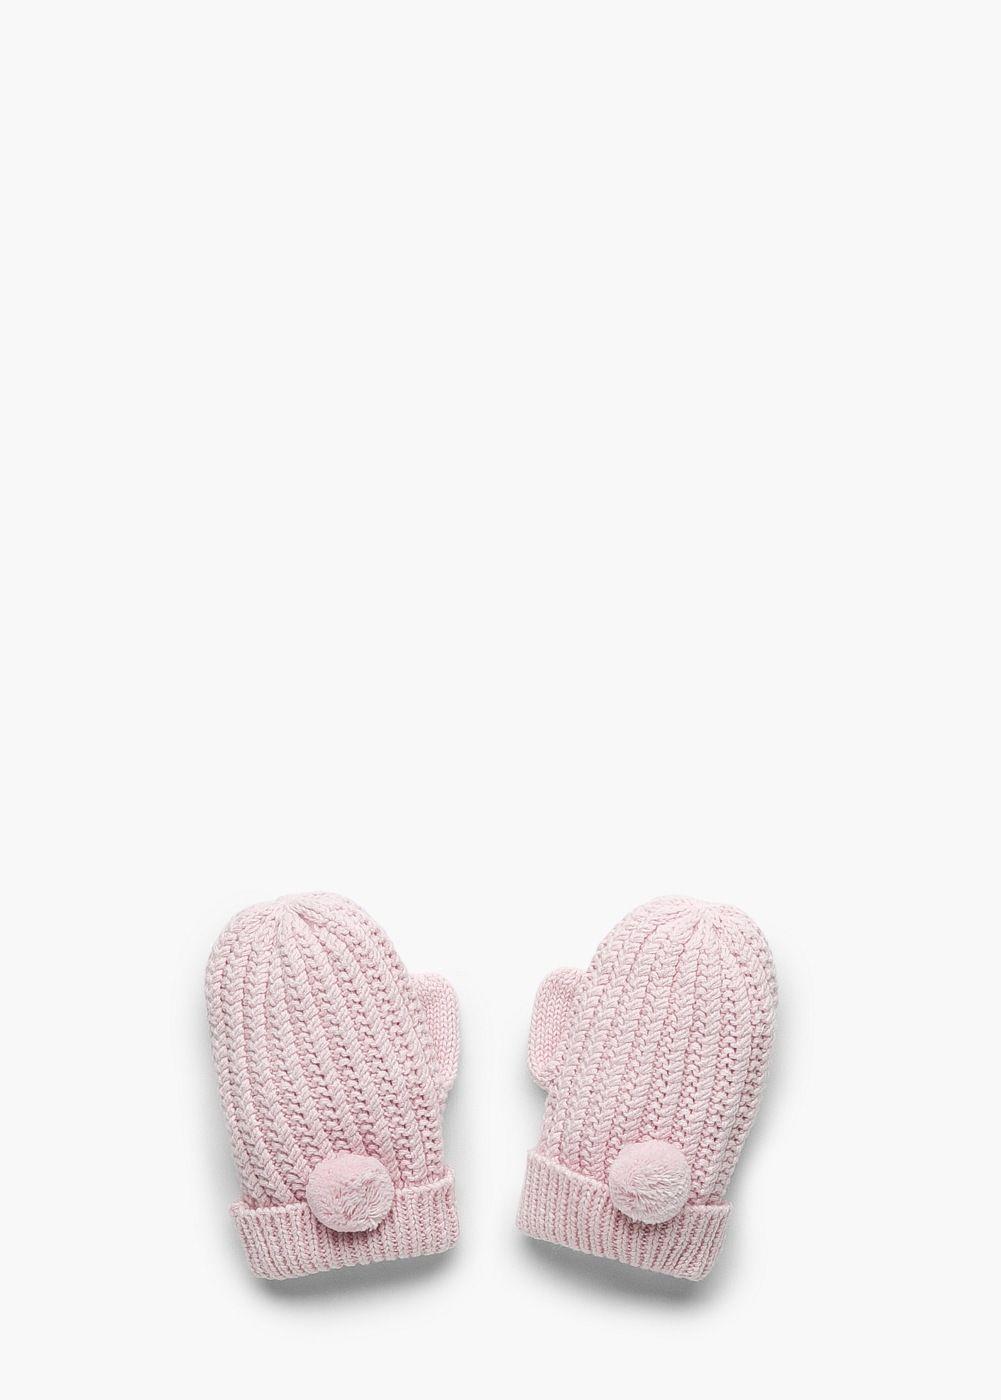 Ribbed knit gloves - Girls  e2925f6b5459